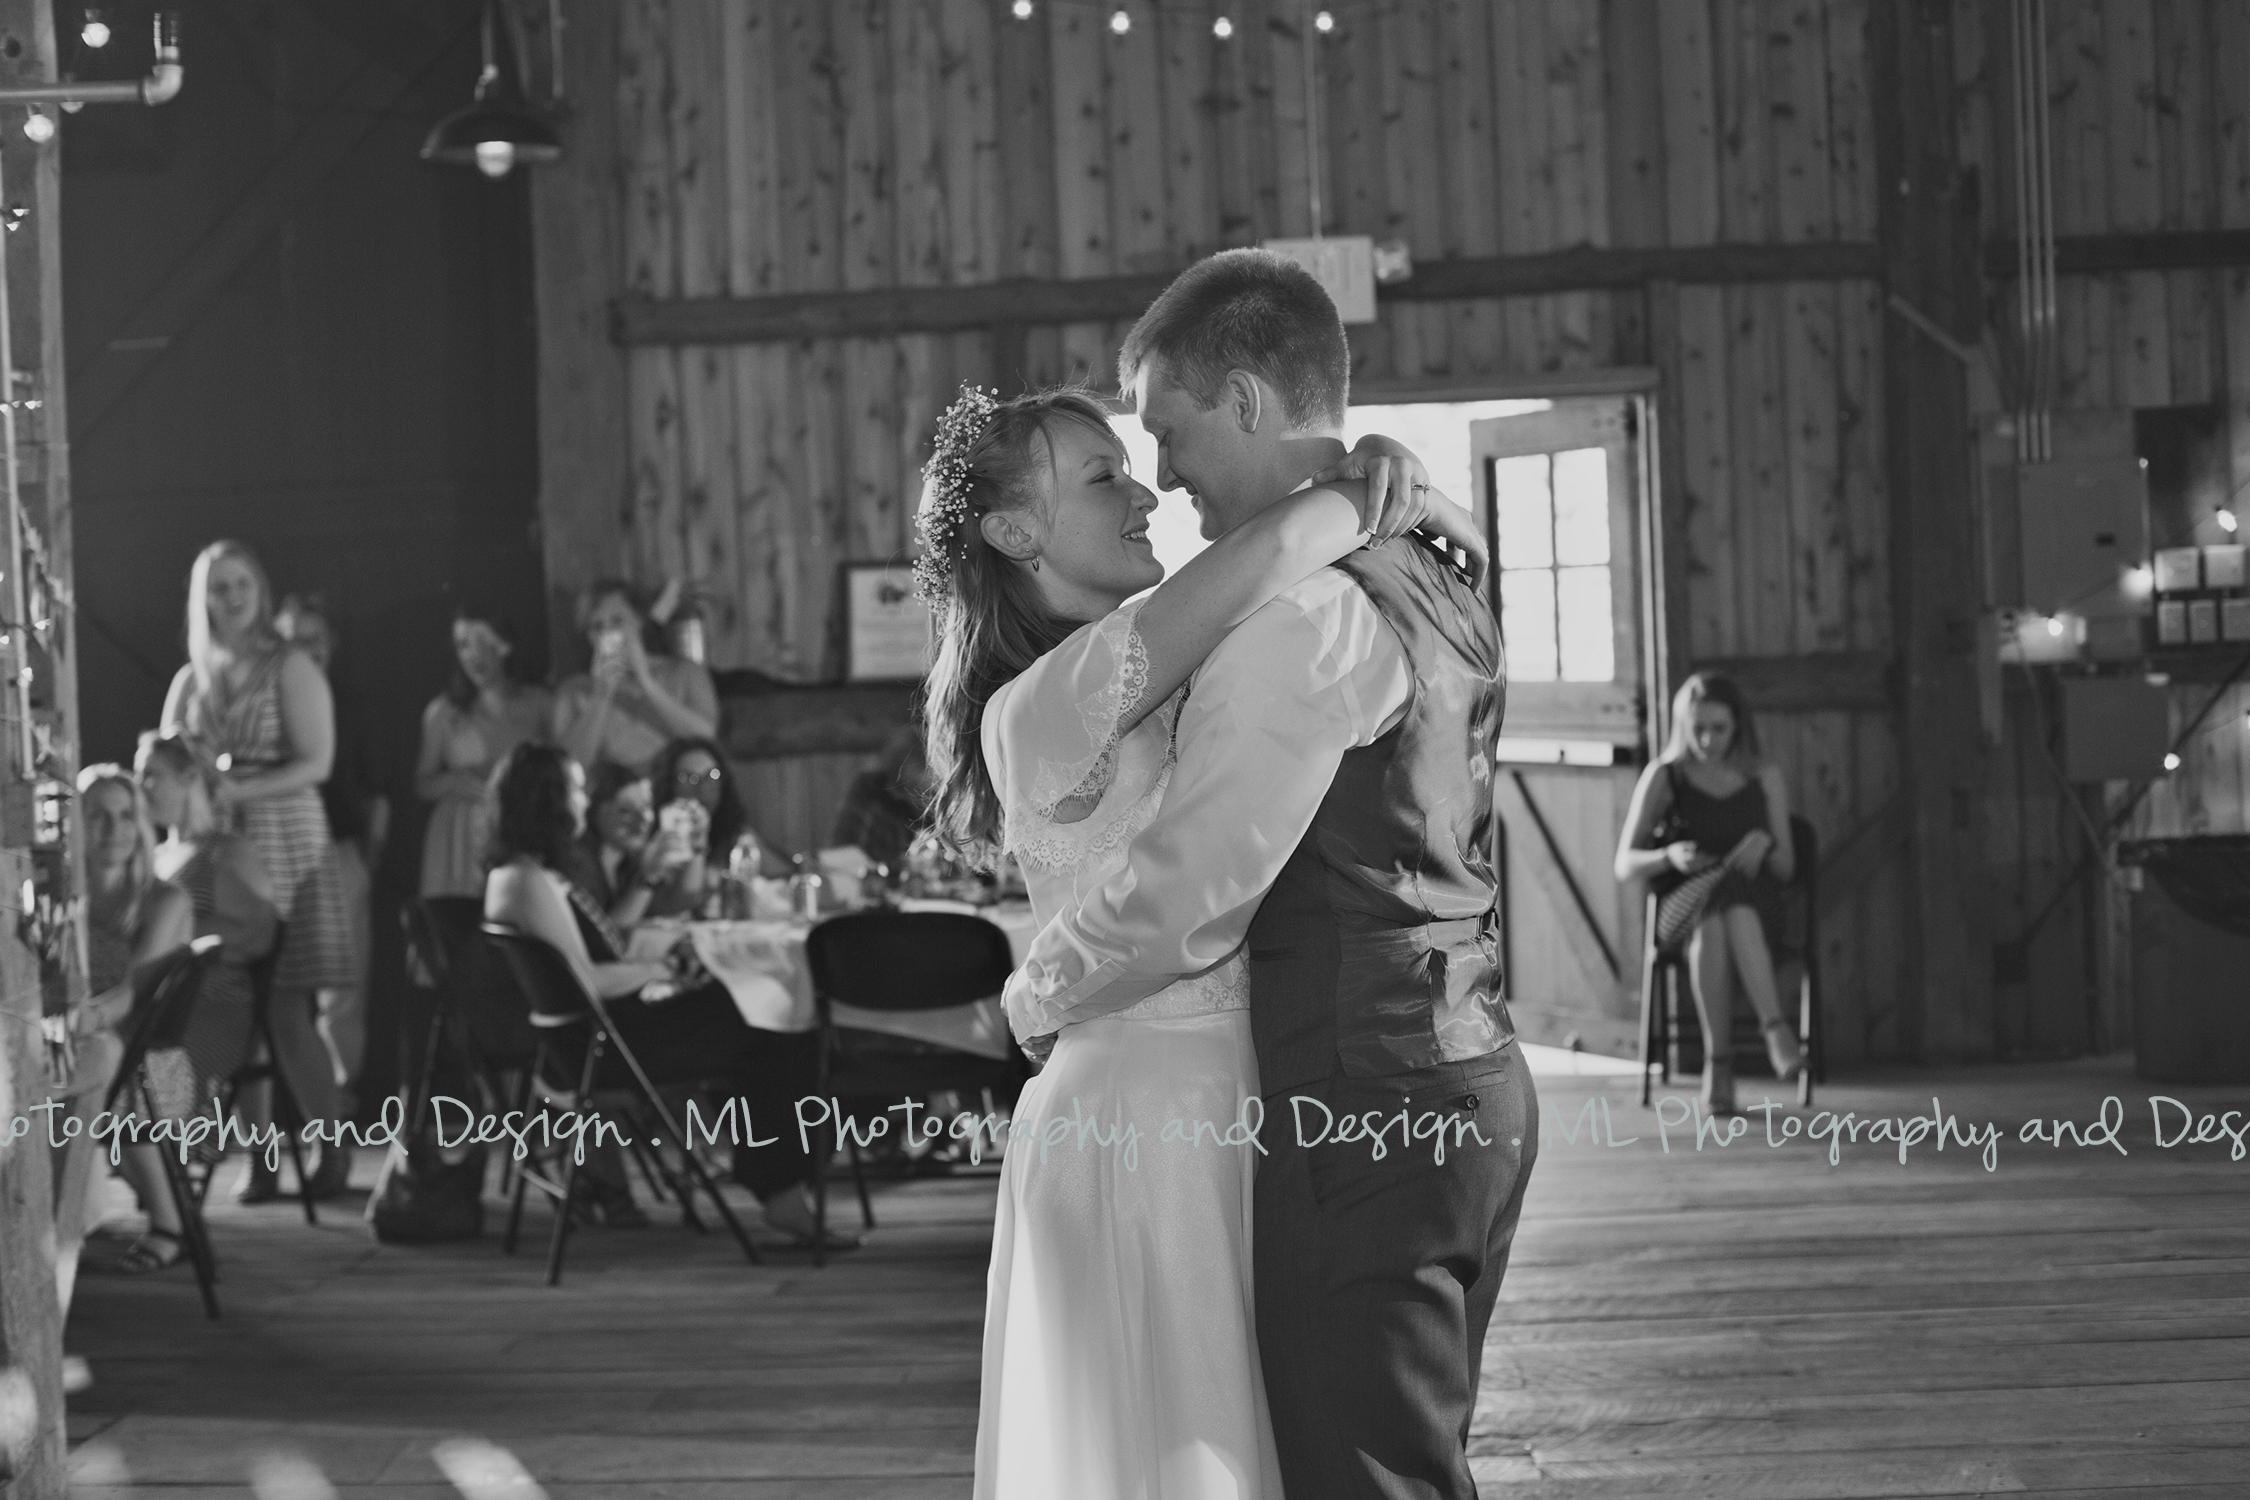 Lac-Lawrann-Conservancy-Wedding-43.jpg